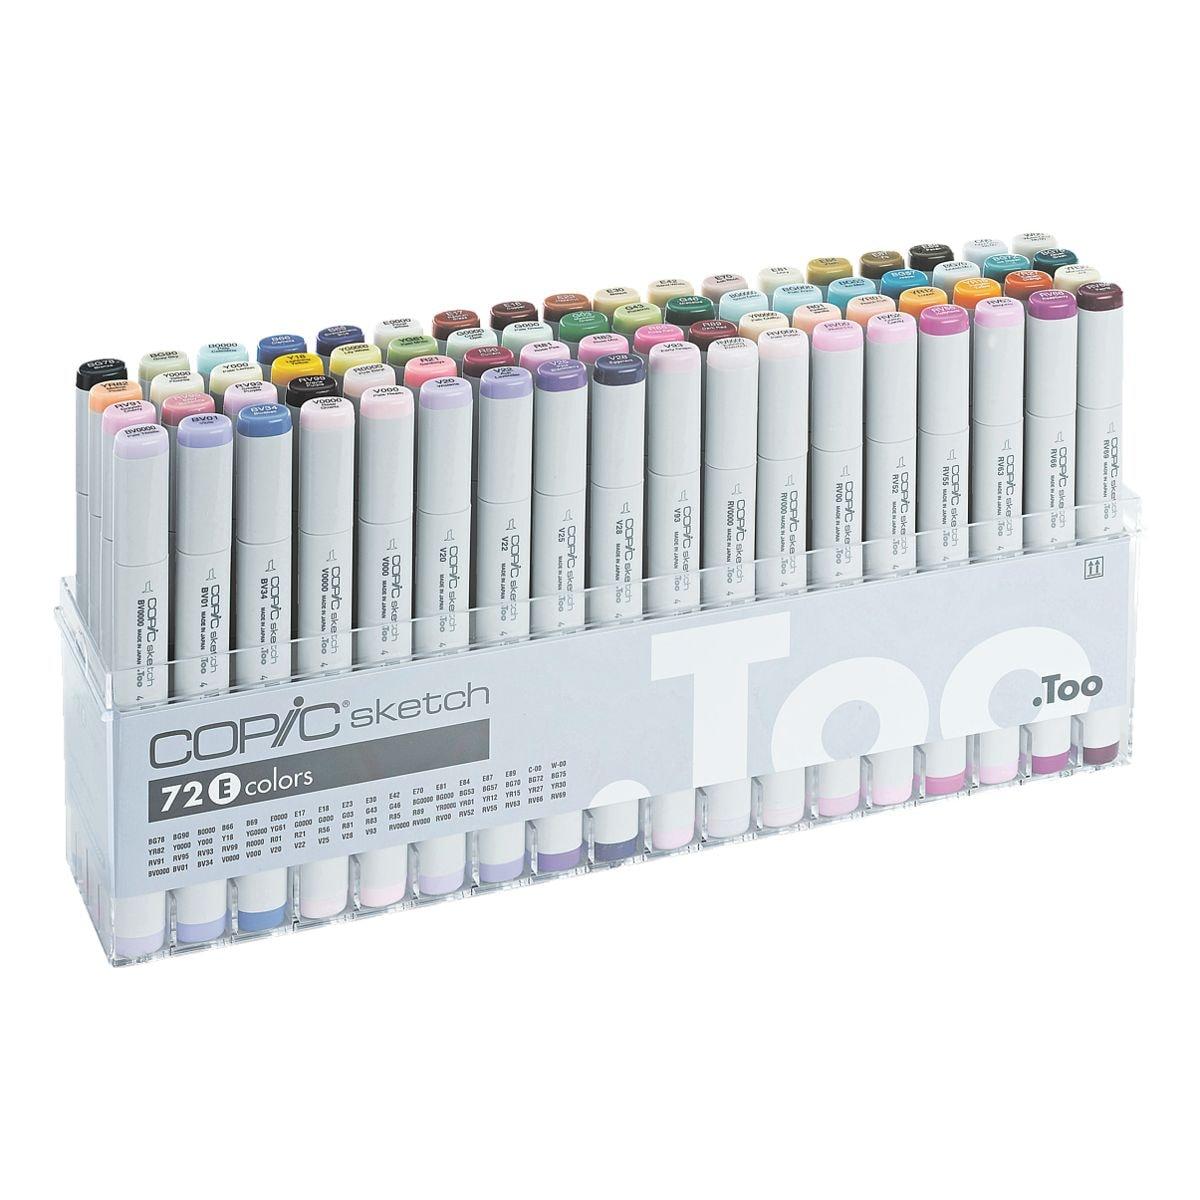 COPIC® Sketch Lot de 72 marqueurs COPIC® Sketch E